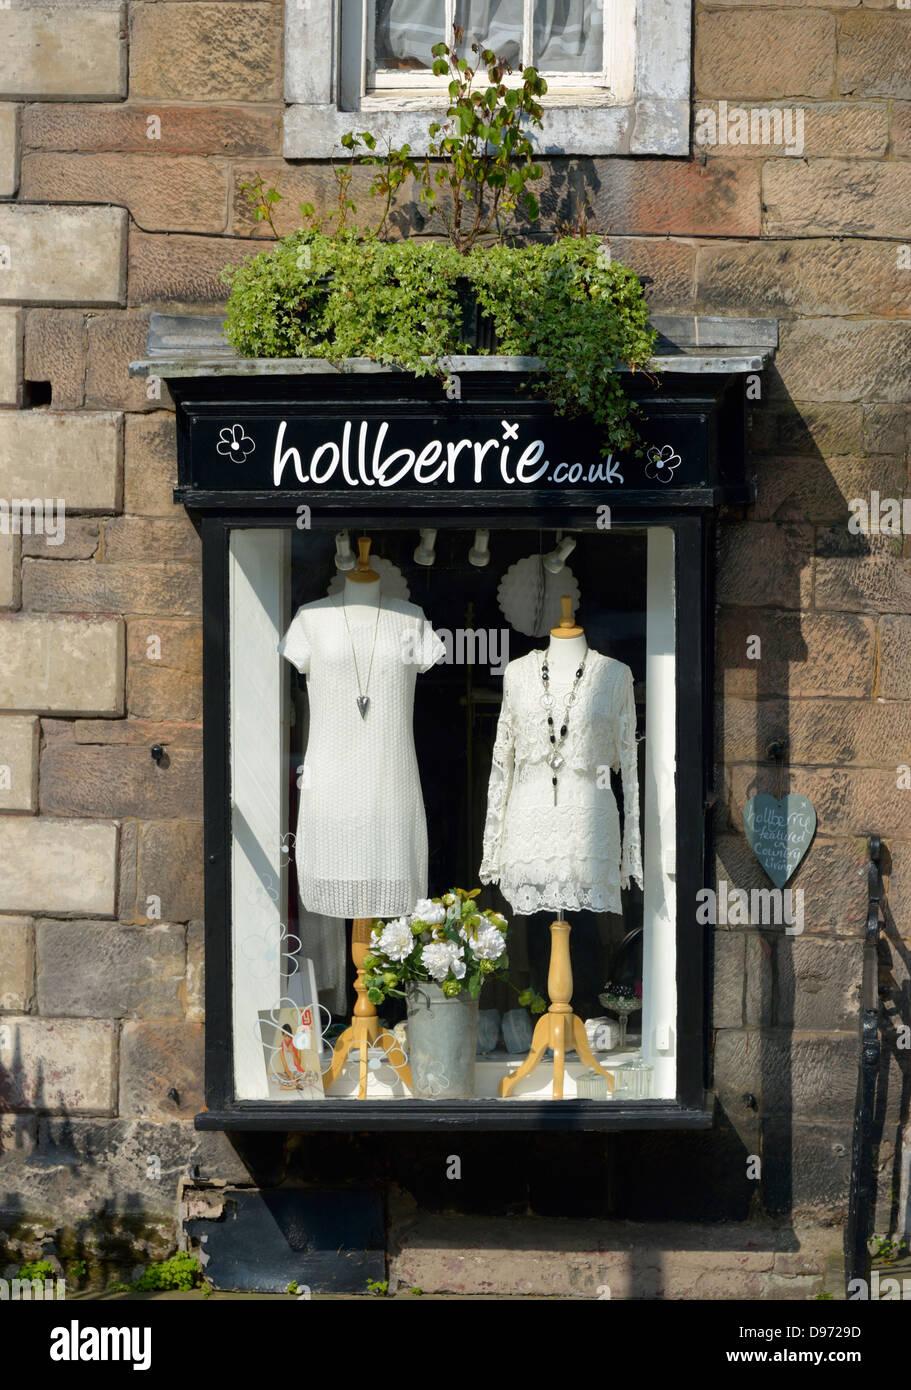 'Hollberrie', dress shop window. Boroughgate, Appleby-in Westmorland, Cumbria, England, United Kingdom, - Stock Image